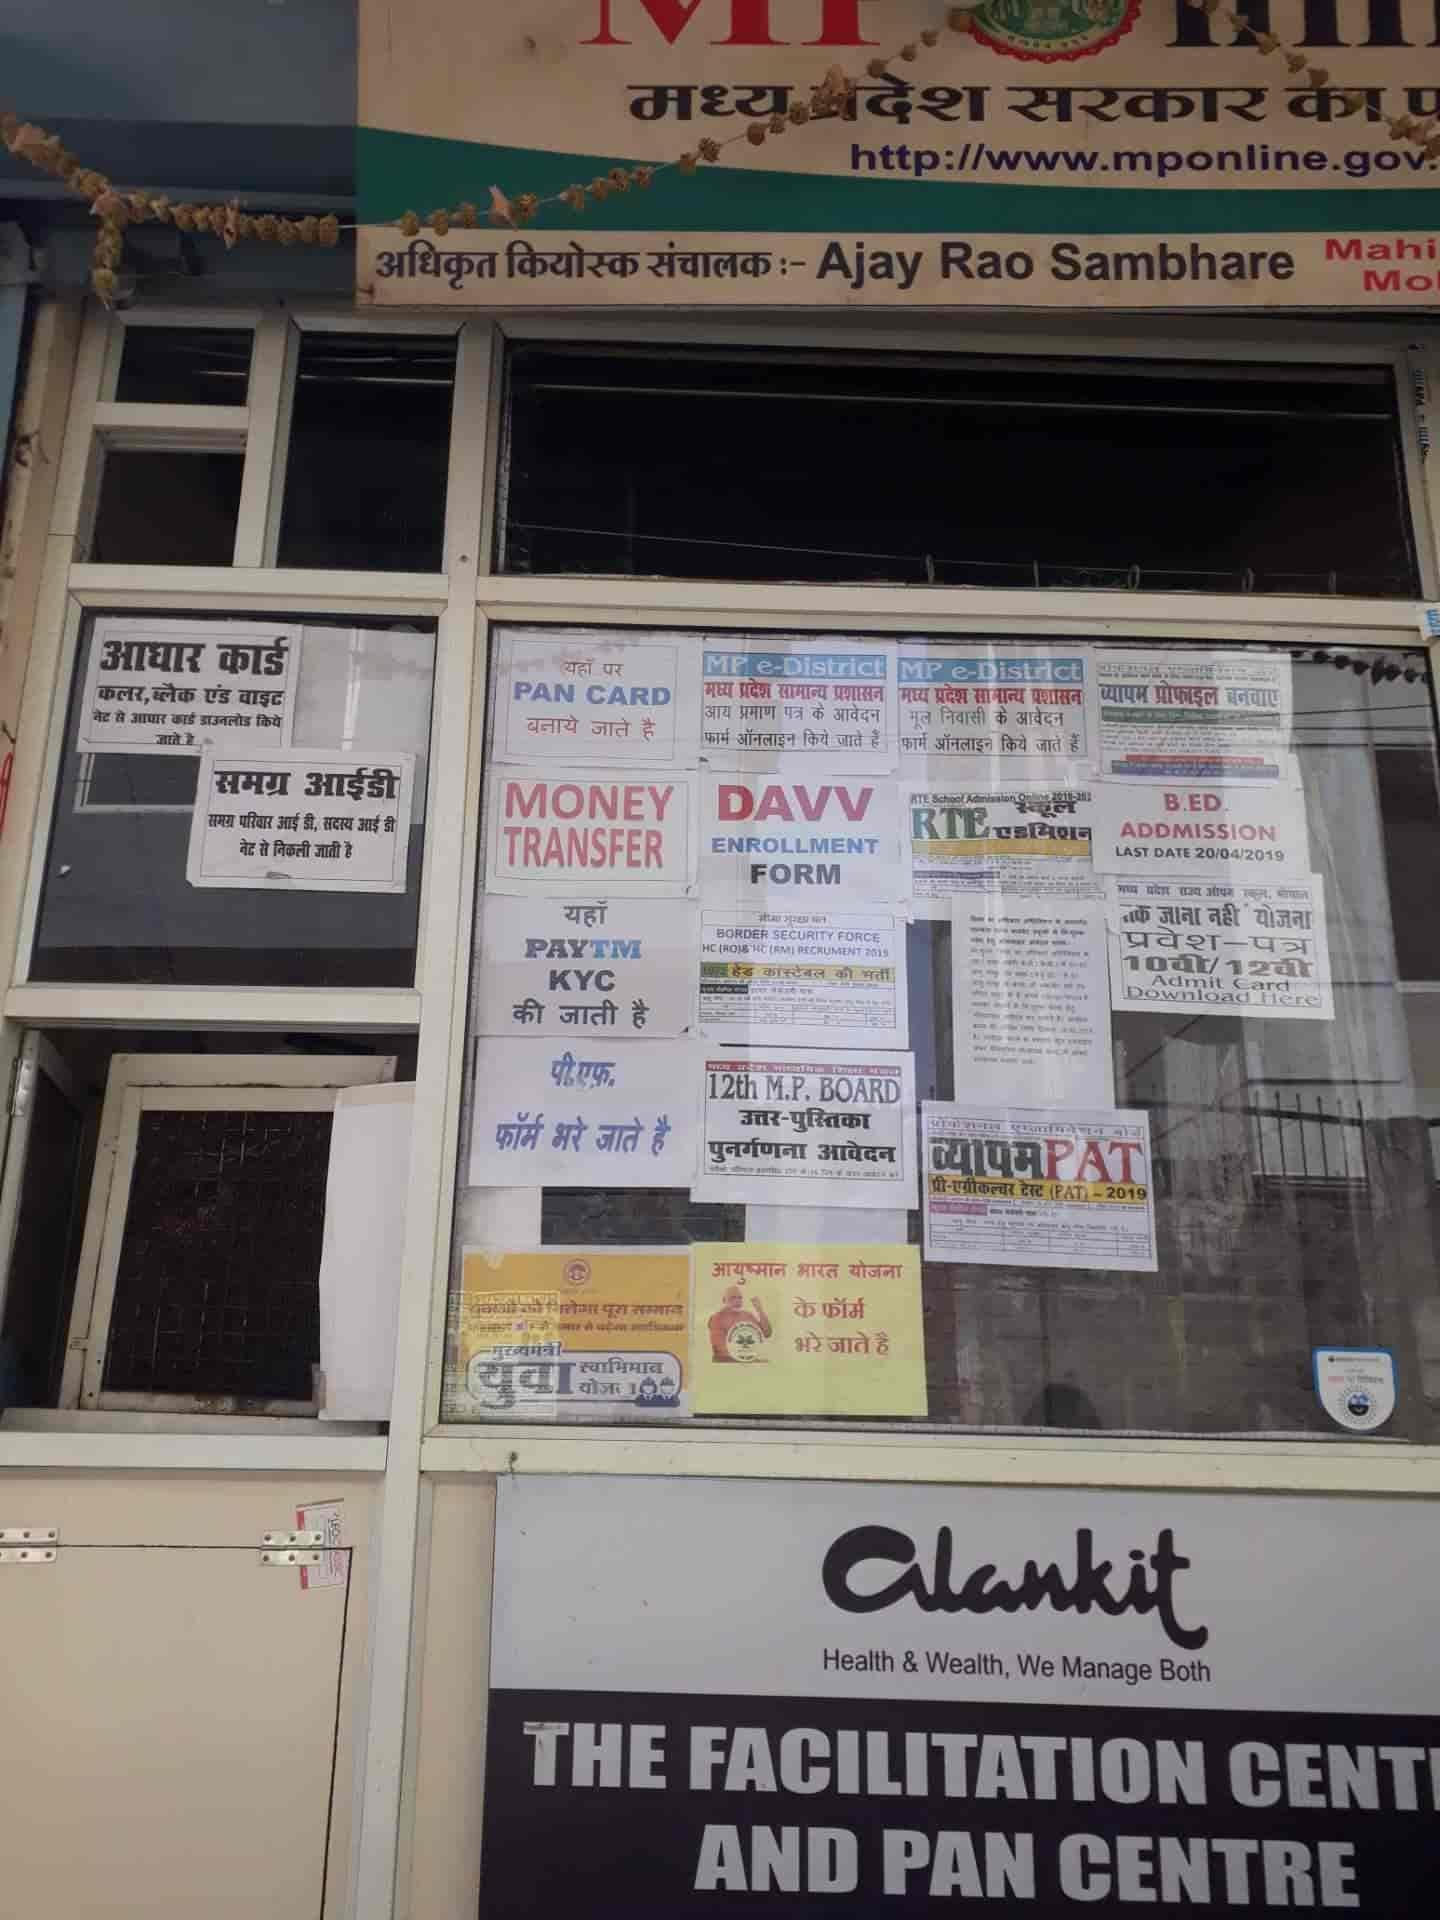 Mahi Cyber Mp Online, Tapeshwari Bagh - General Stores in Indore